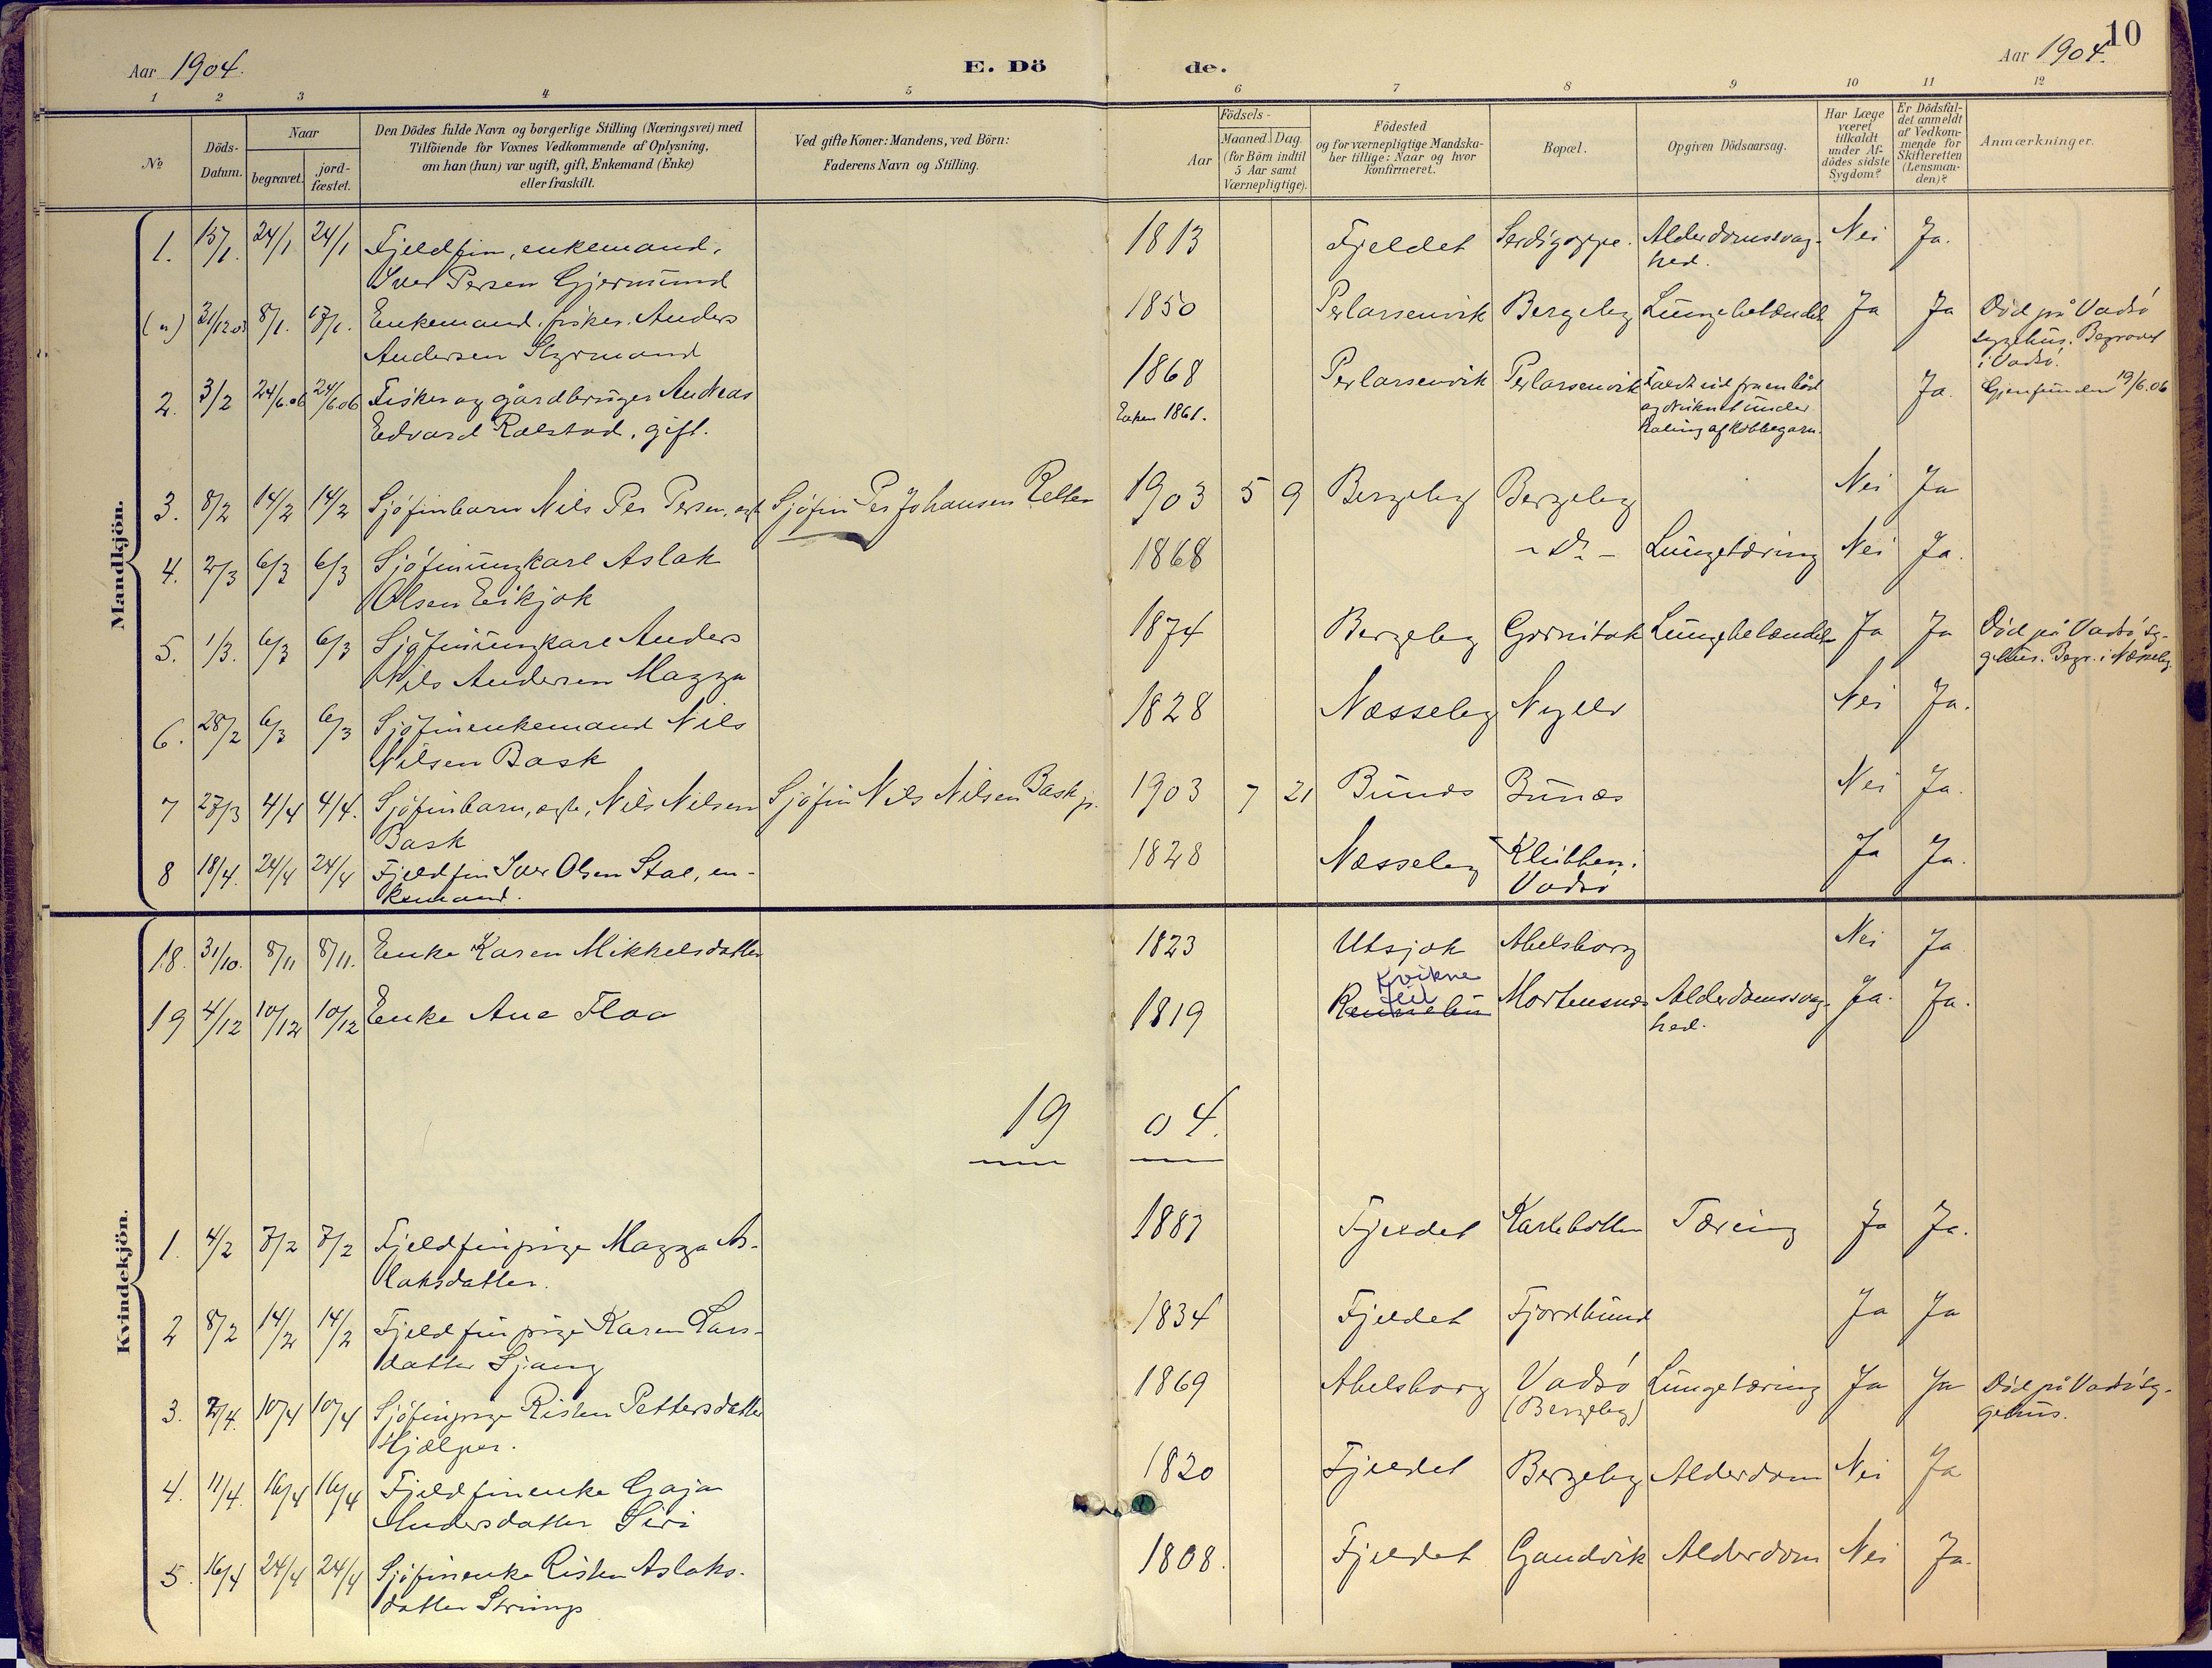 SATØ, Nesseby sokneprestkontor, H/Ha/L0007kirke: Ministerialbok nr. 7, 1898-1921, s. 10